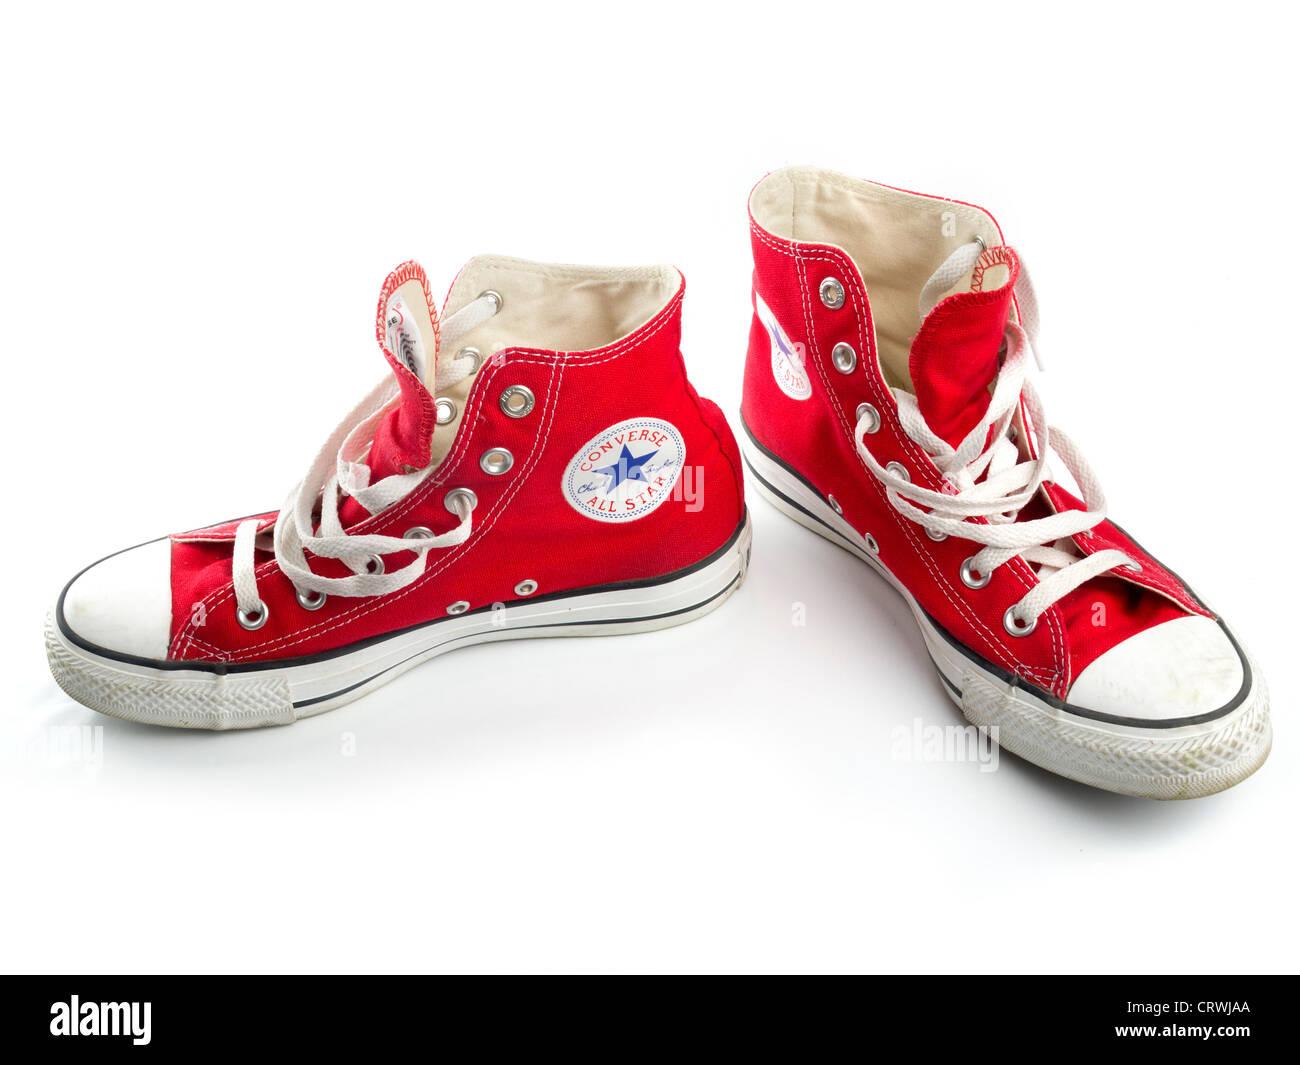 Roten Converse Chuck Taylor All Star Schuh paar